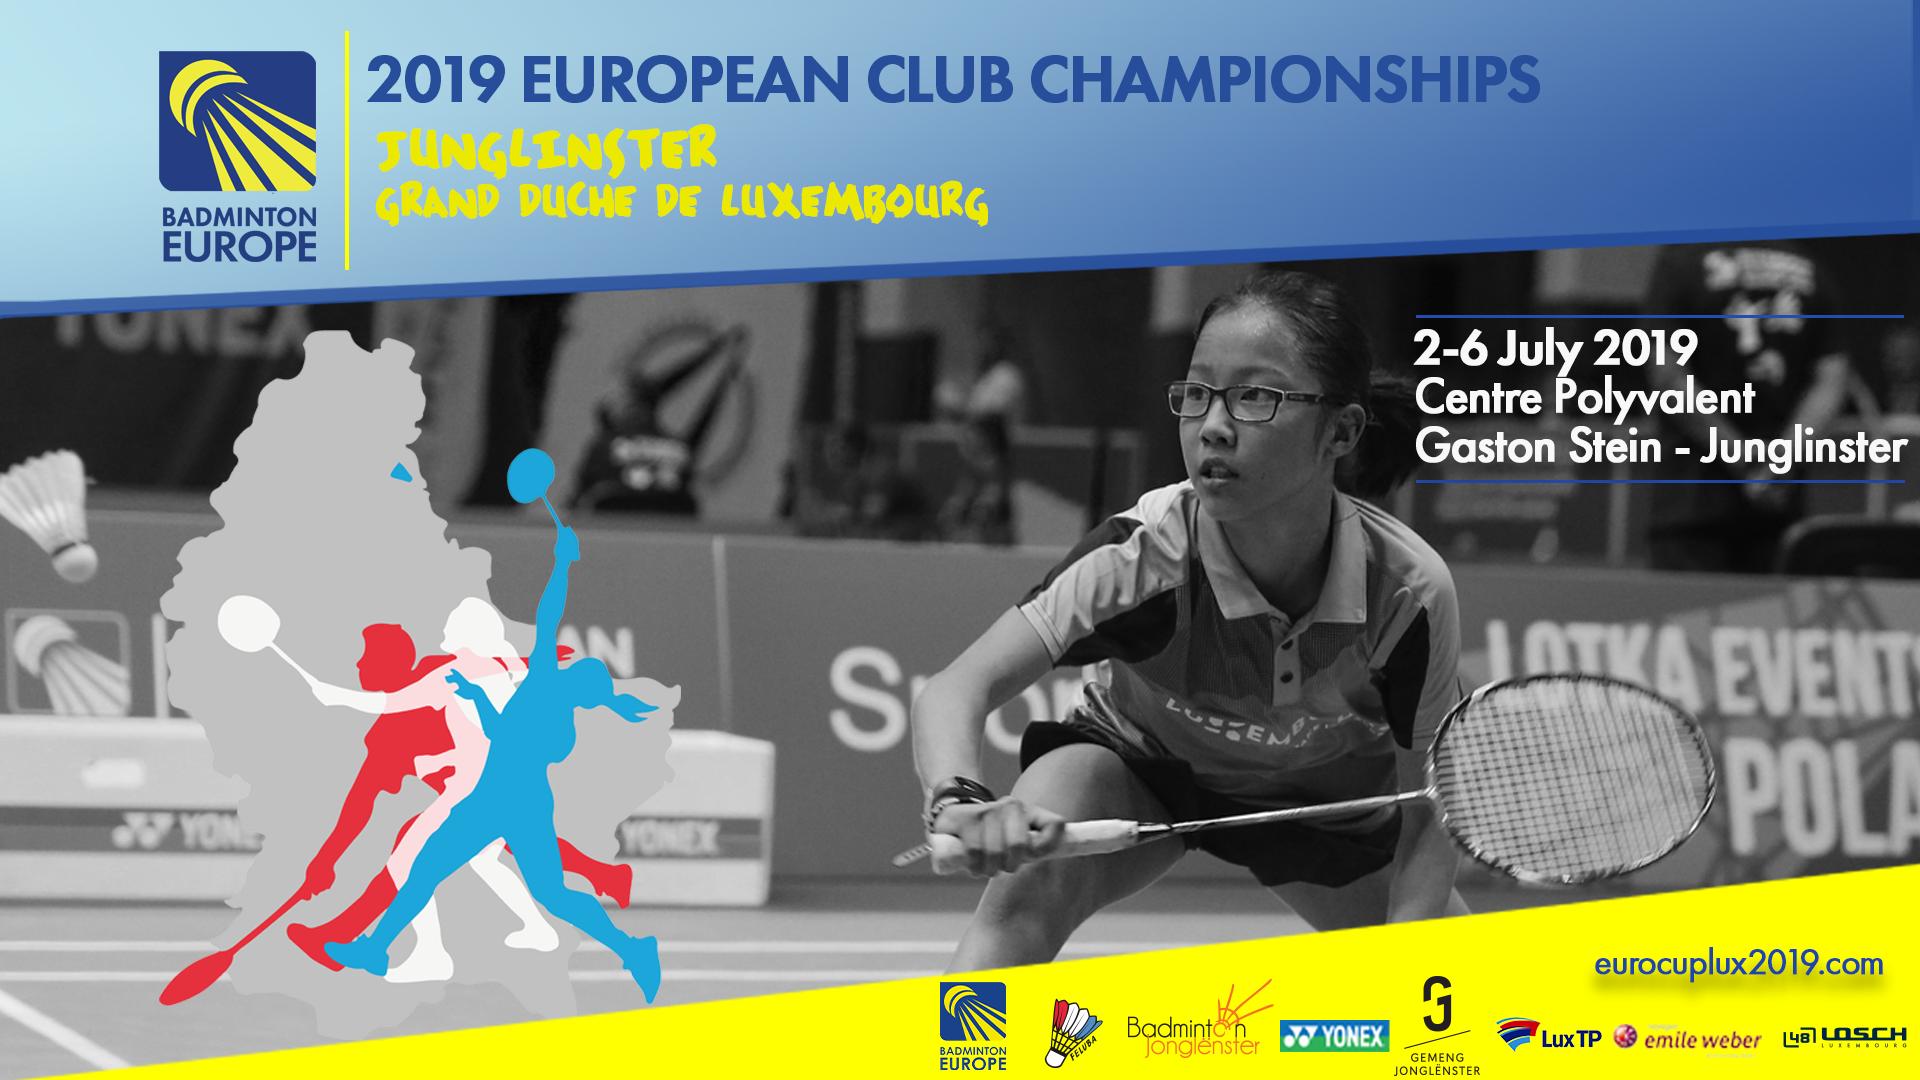 European Club Championships : Quarter Finals at 10h and 13h, Semi Finals at 17h and 19h